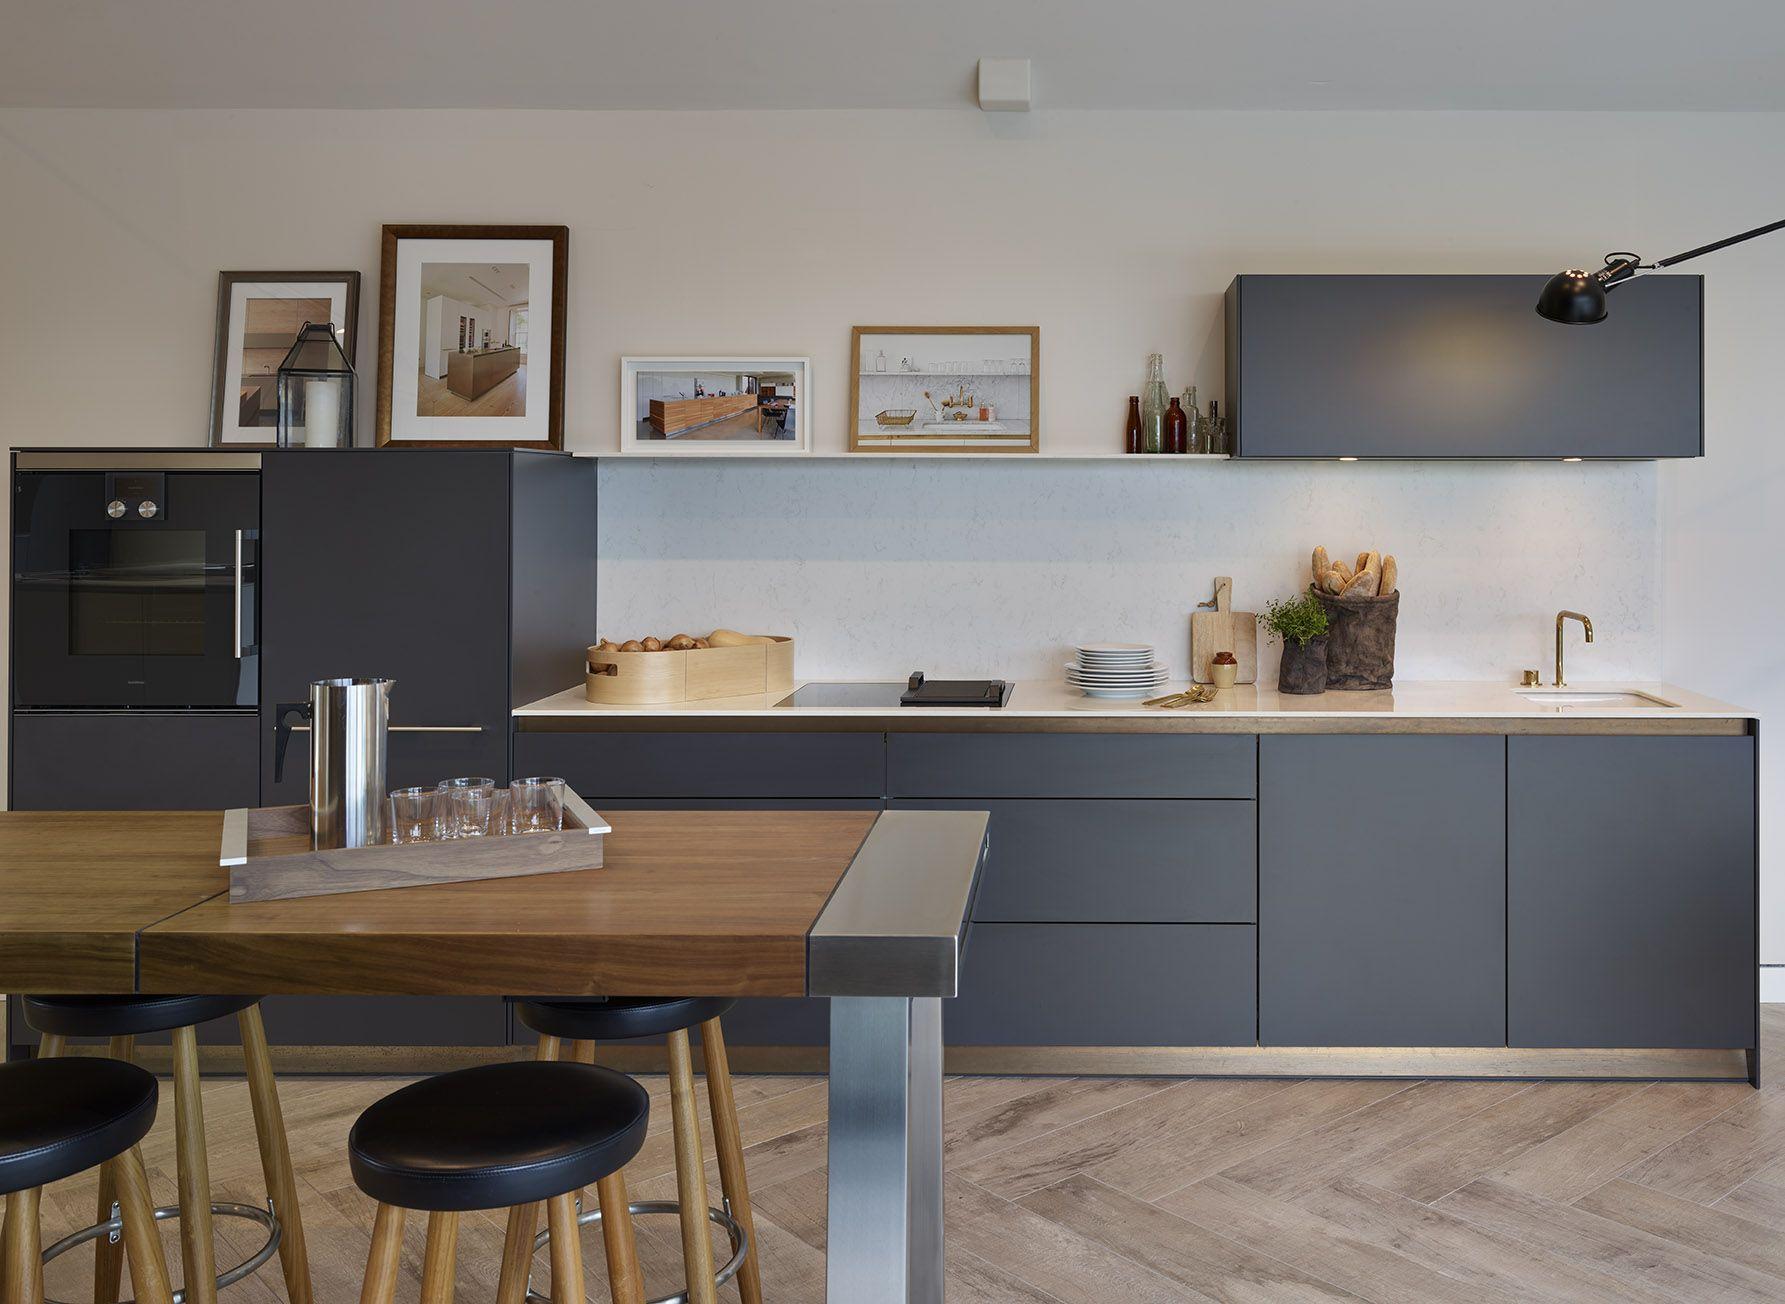 Kitchen architecture bulthaup showroom cheshire showroom kitchen